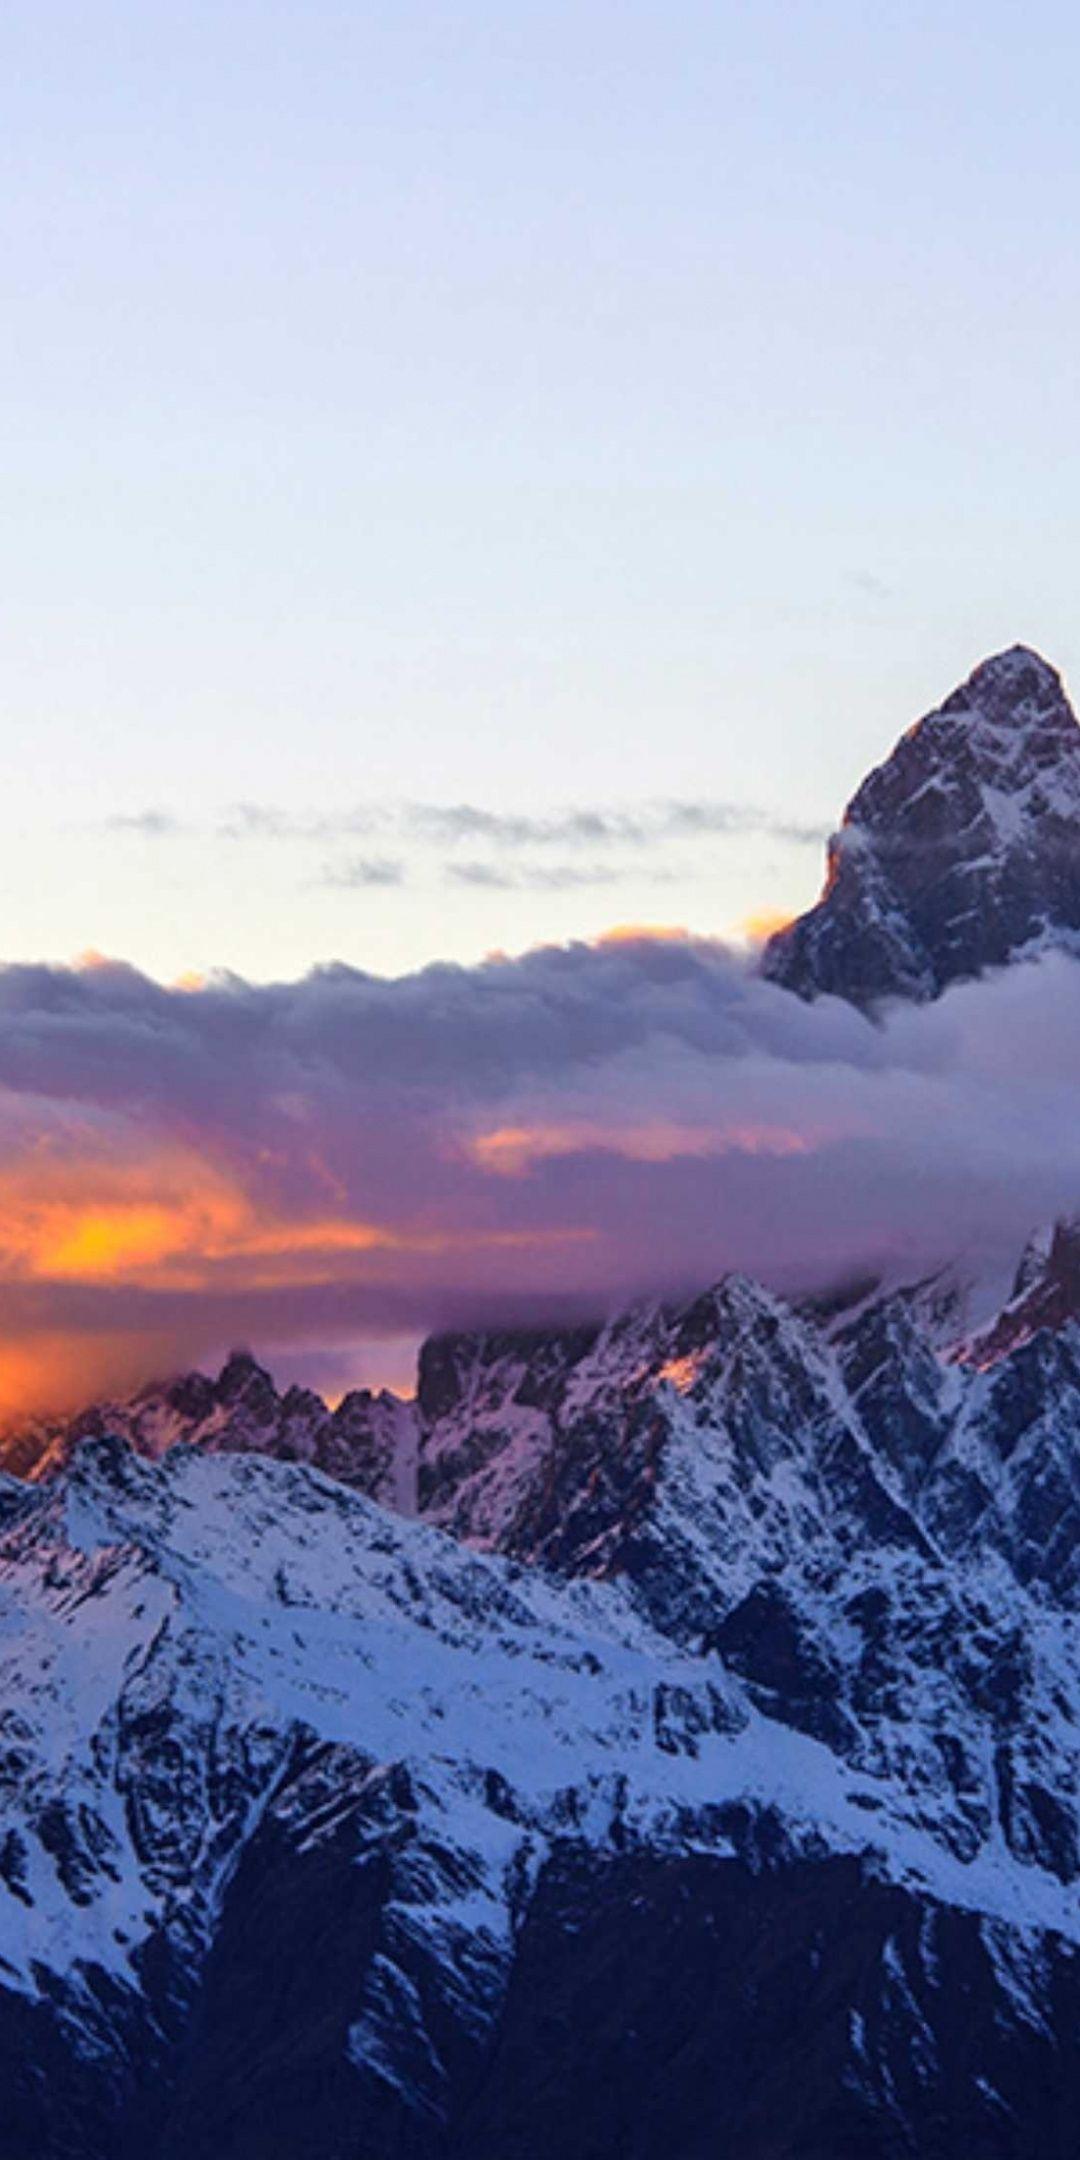 Sunset Mountains Peak Clouds 1080x2160 Wallpaper Wallpaper